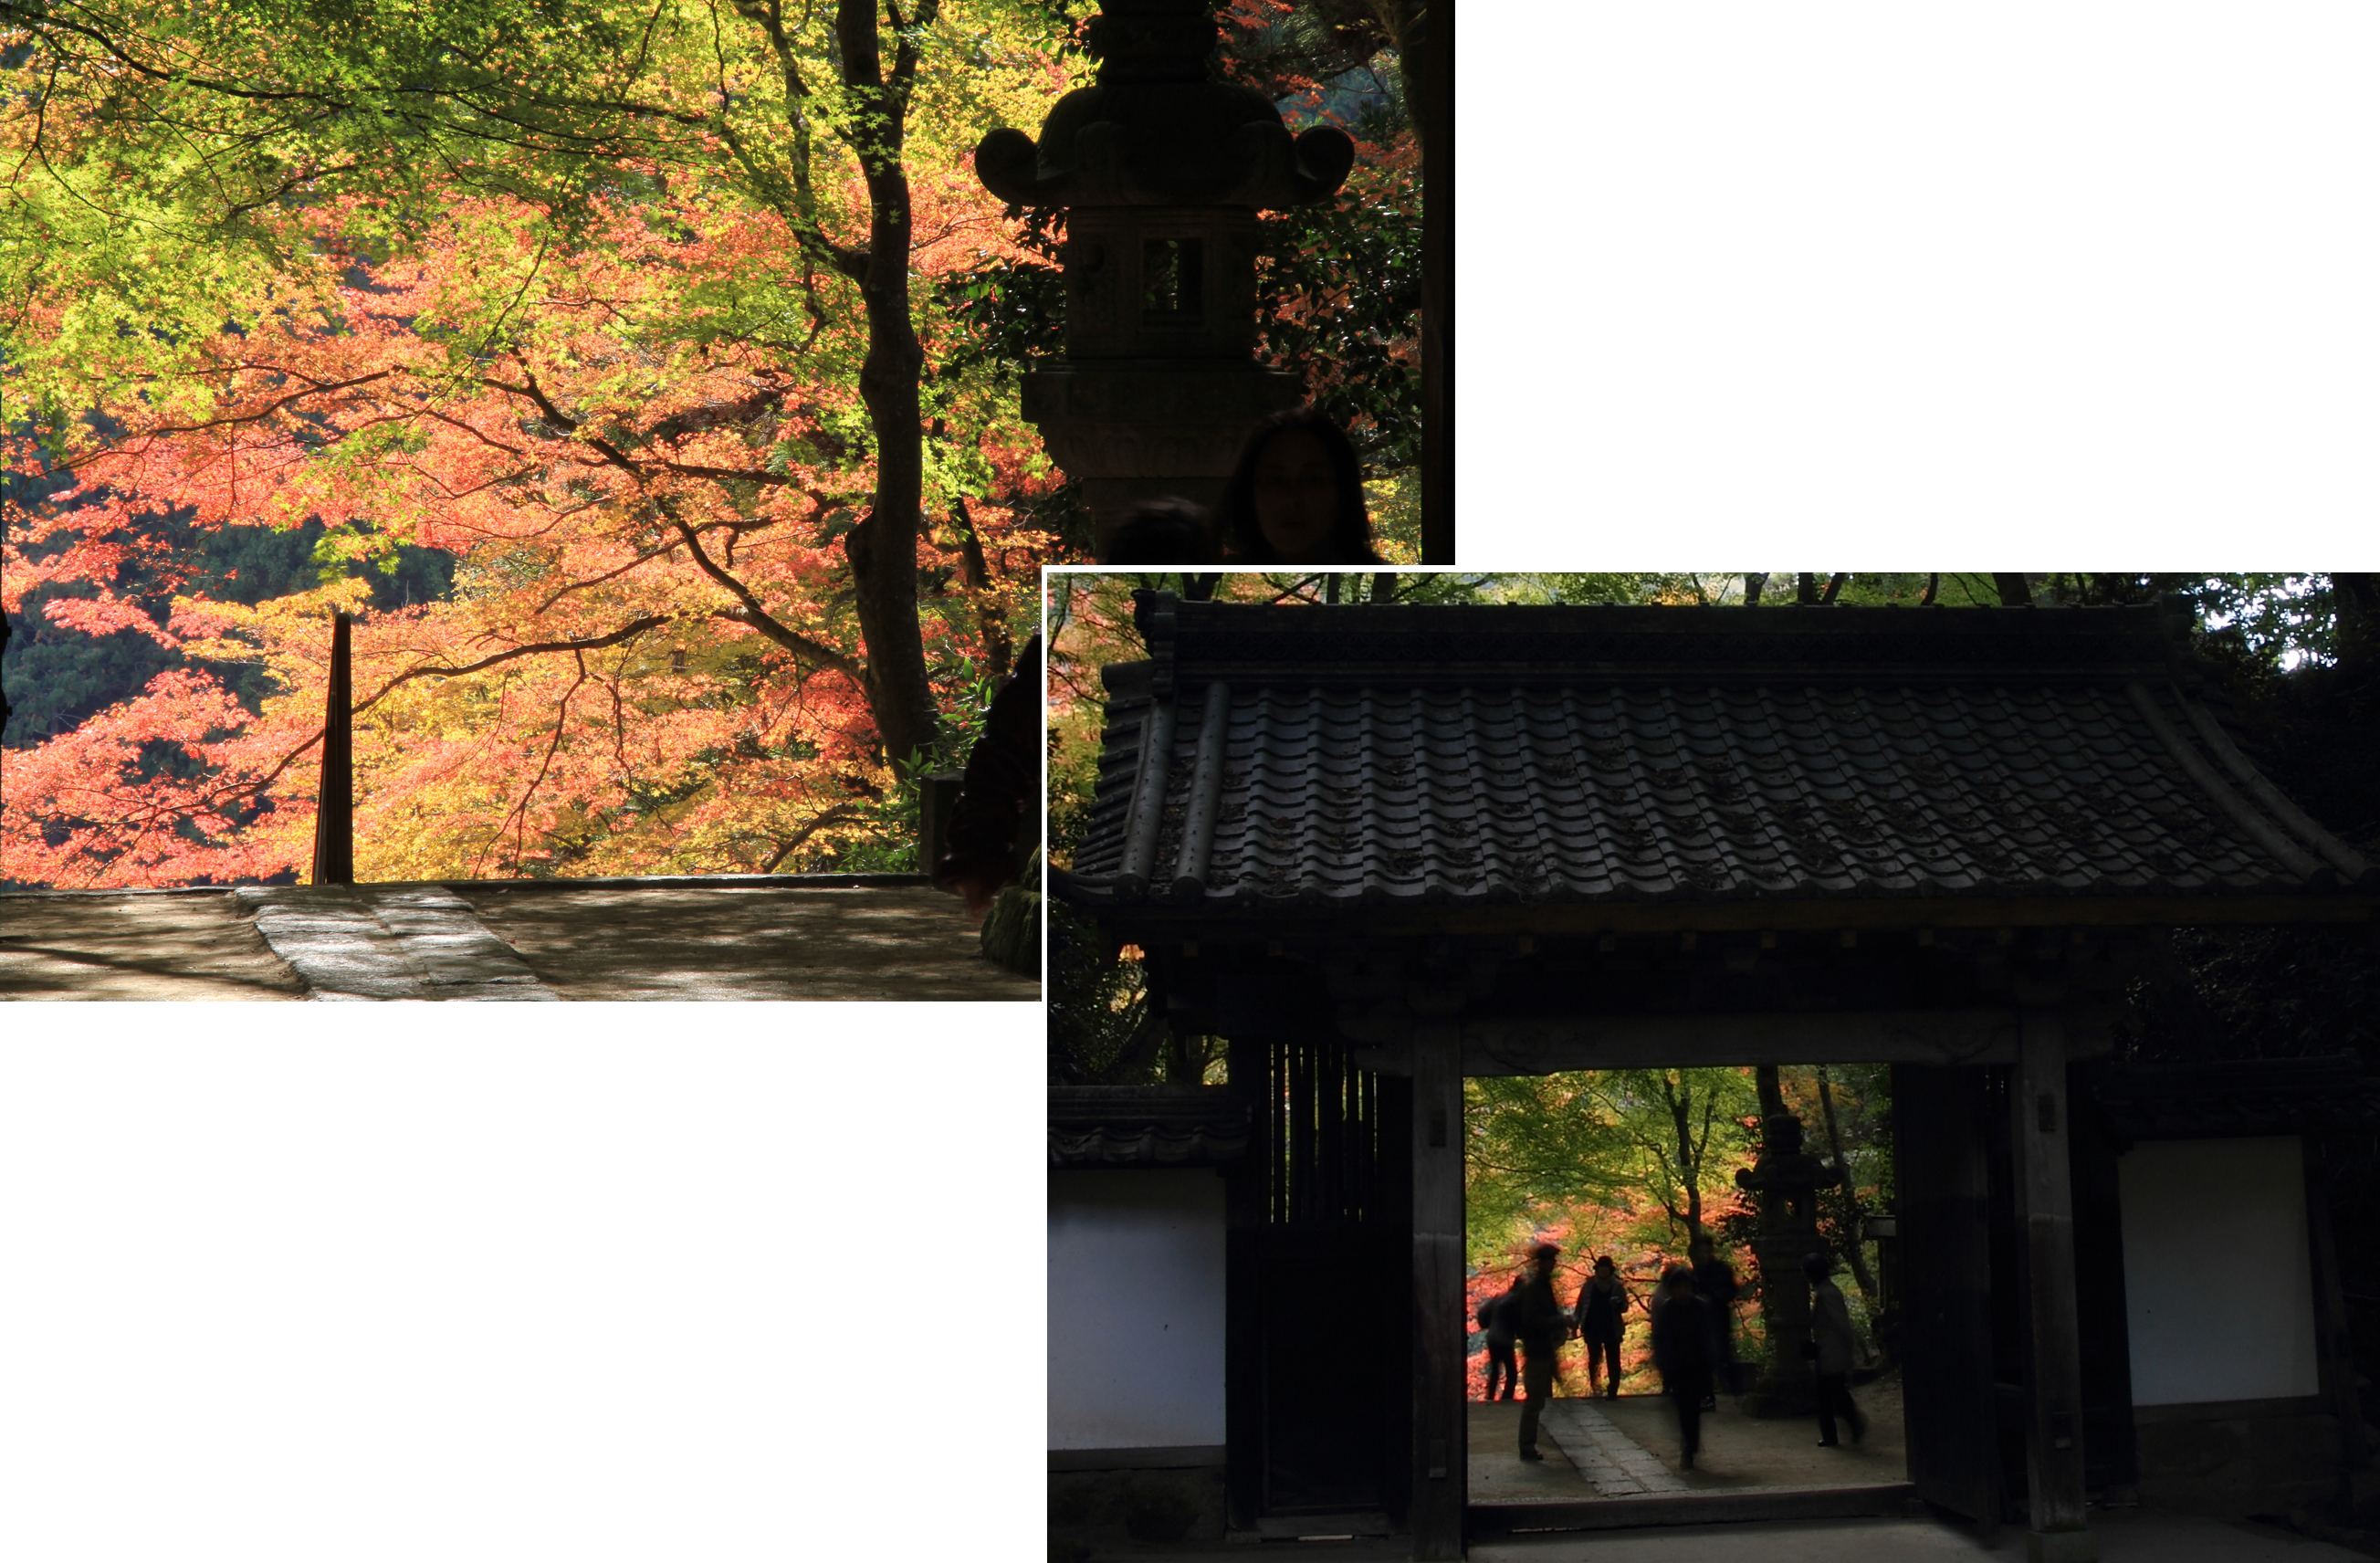 Top of stairs of Kojakuji Temple